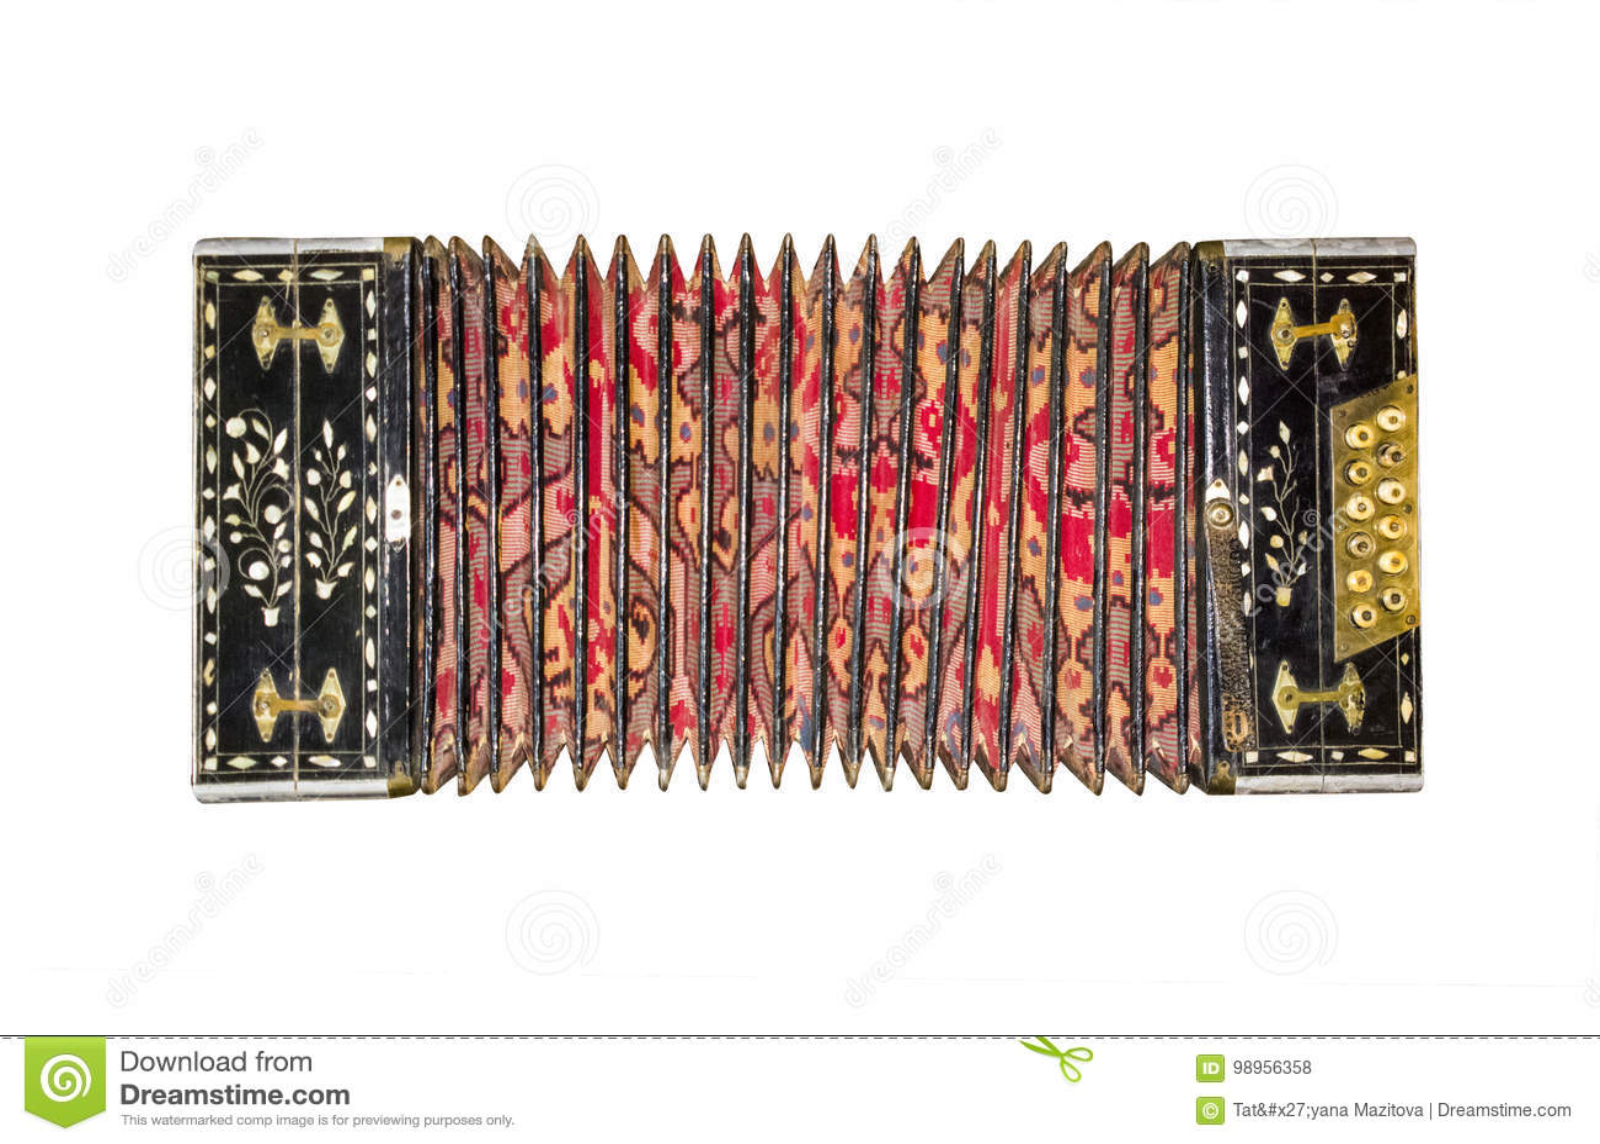 Старый изолированный аккордеон Винтажная гармоника Ретро аккордеон кнопки